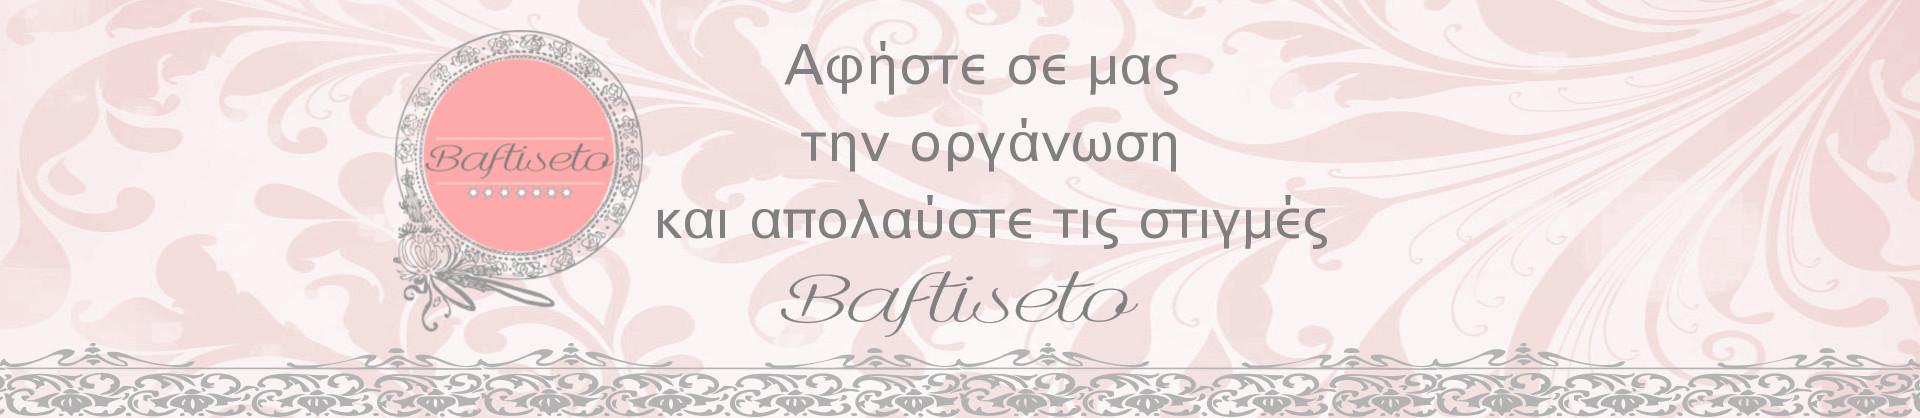 Baftiseto | Αφήστε σε μας την οργάνωση και απολαύστε τις στιγμές